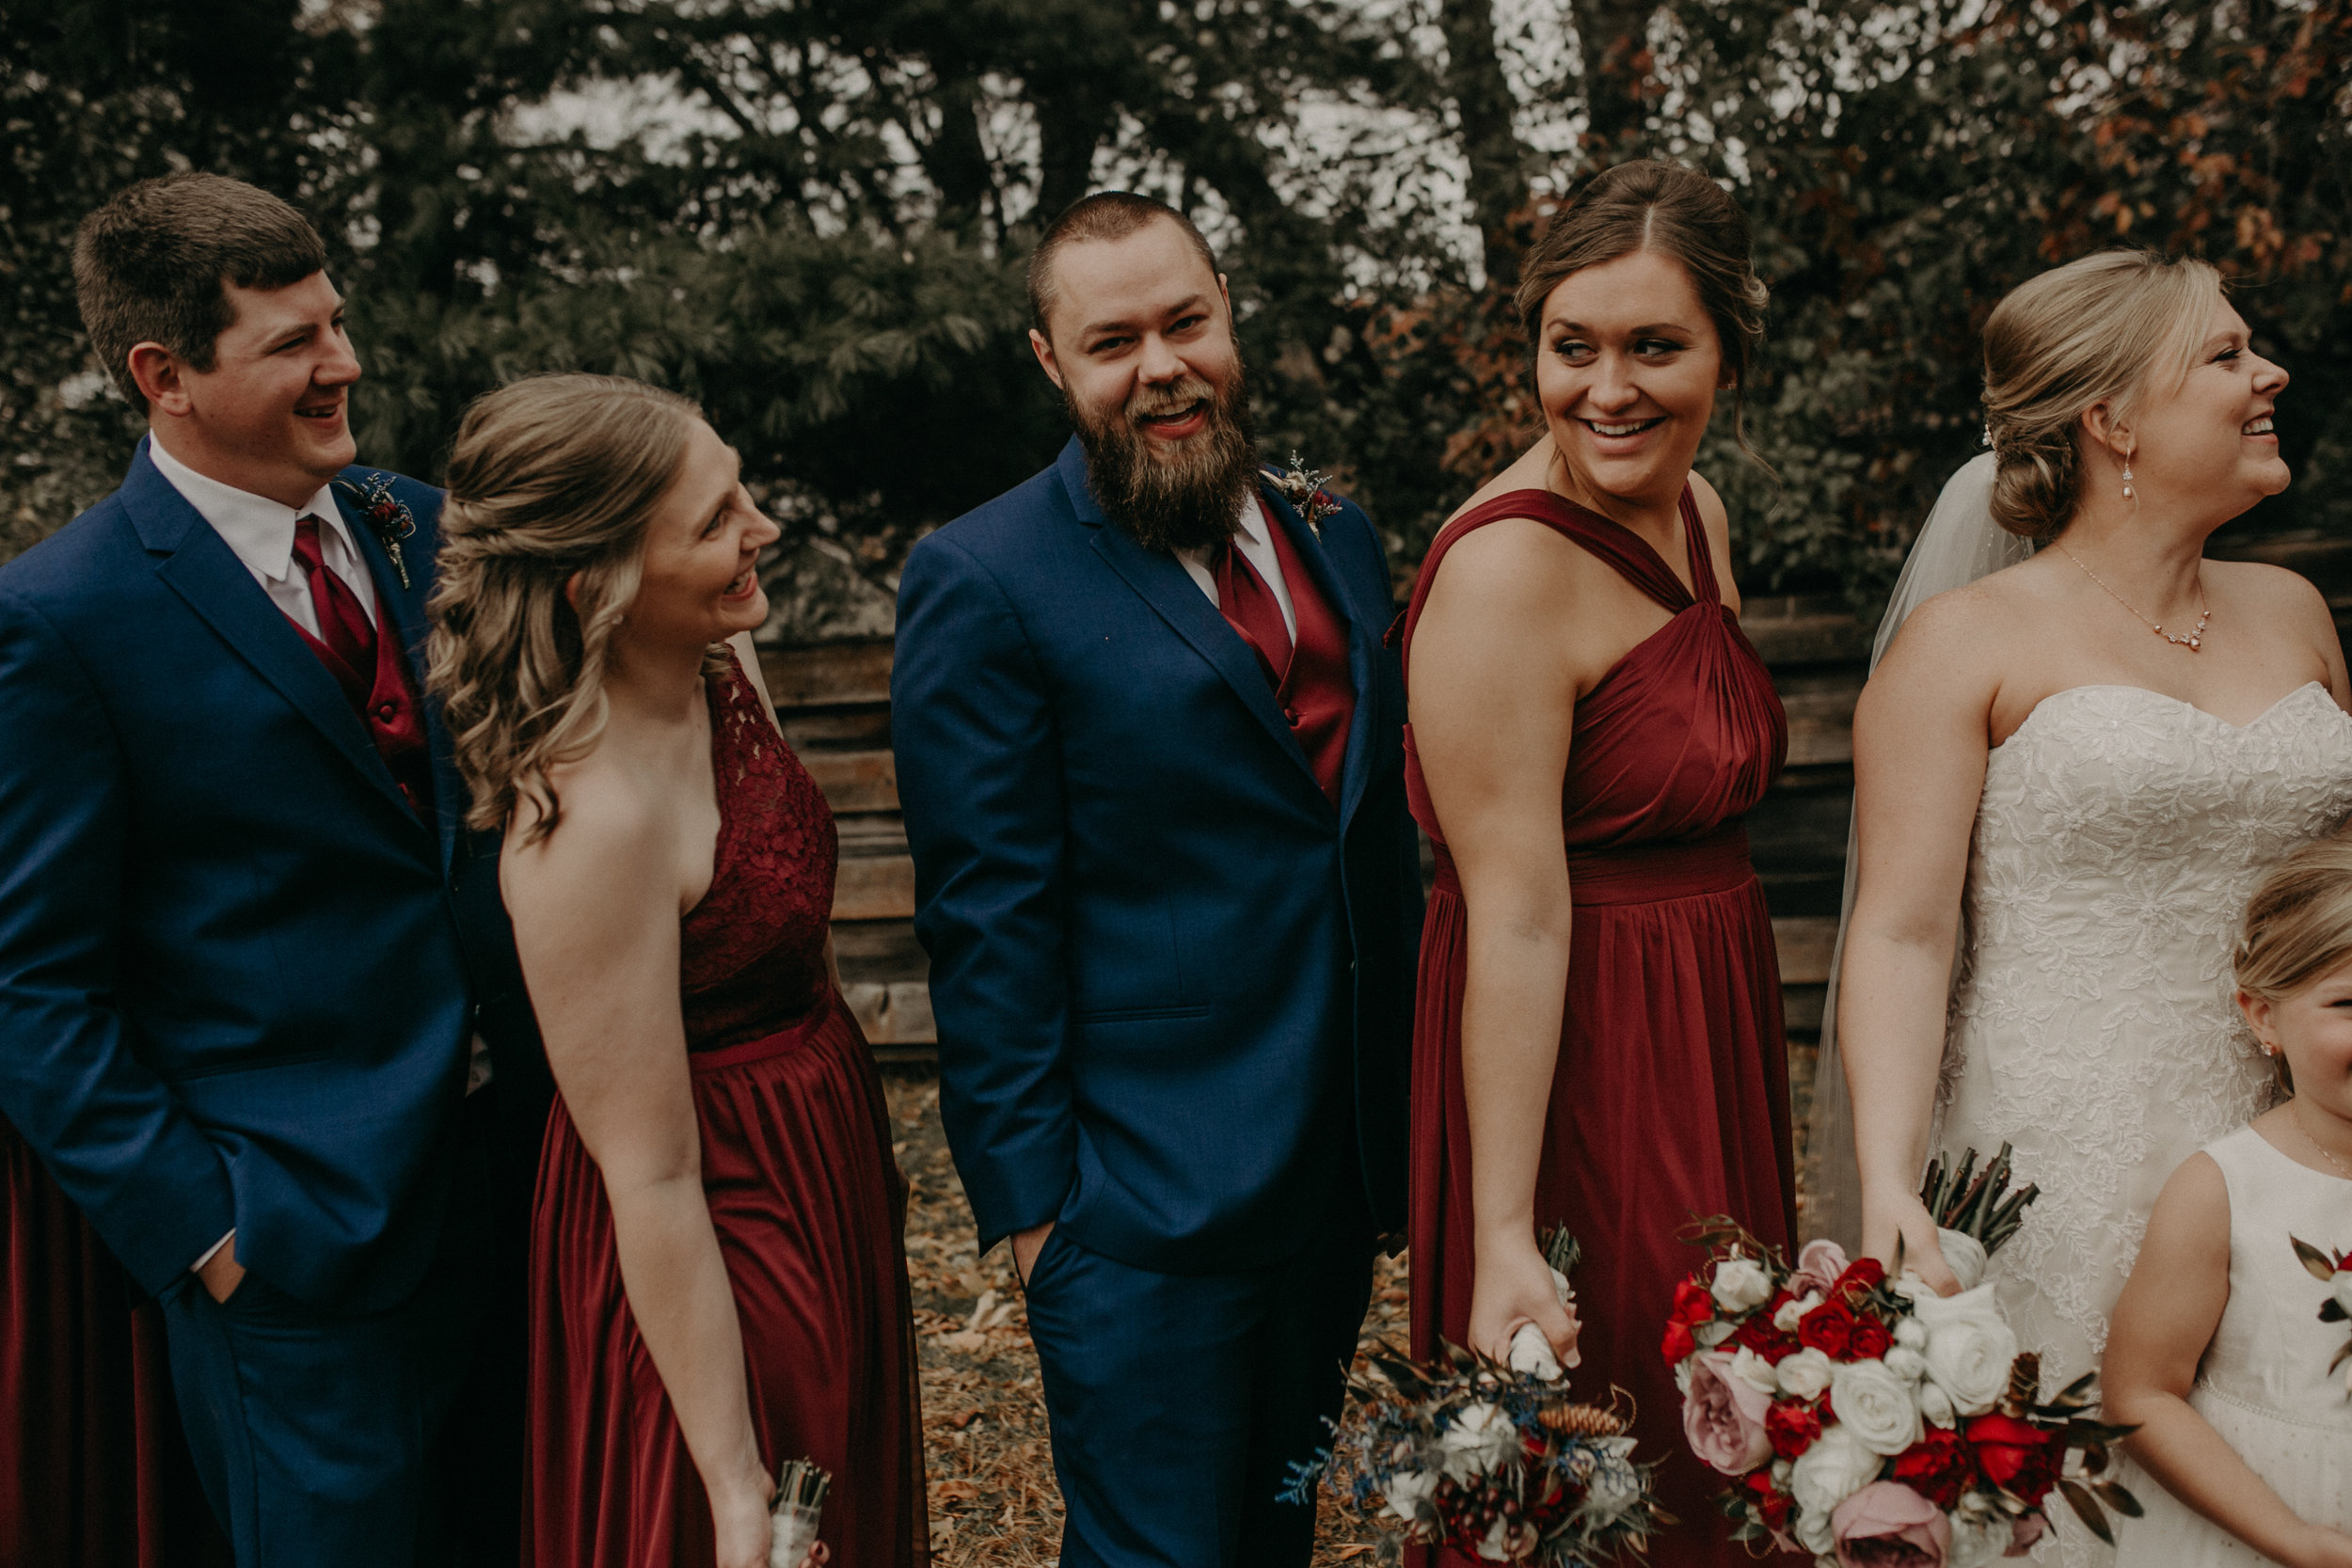 Weisenbeck_Wedding_Oct2018-144.jpg